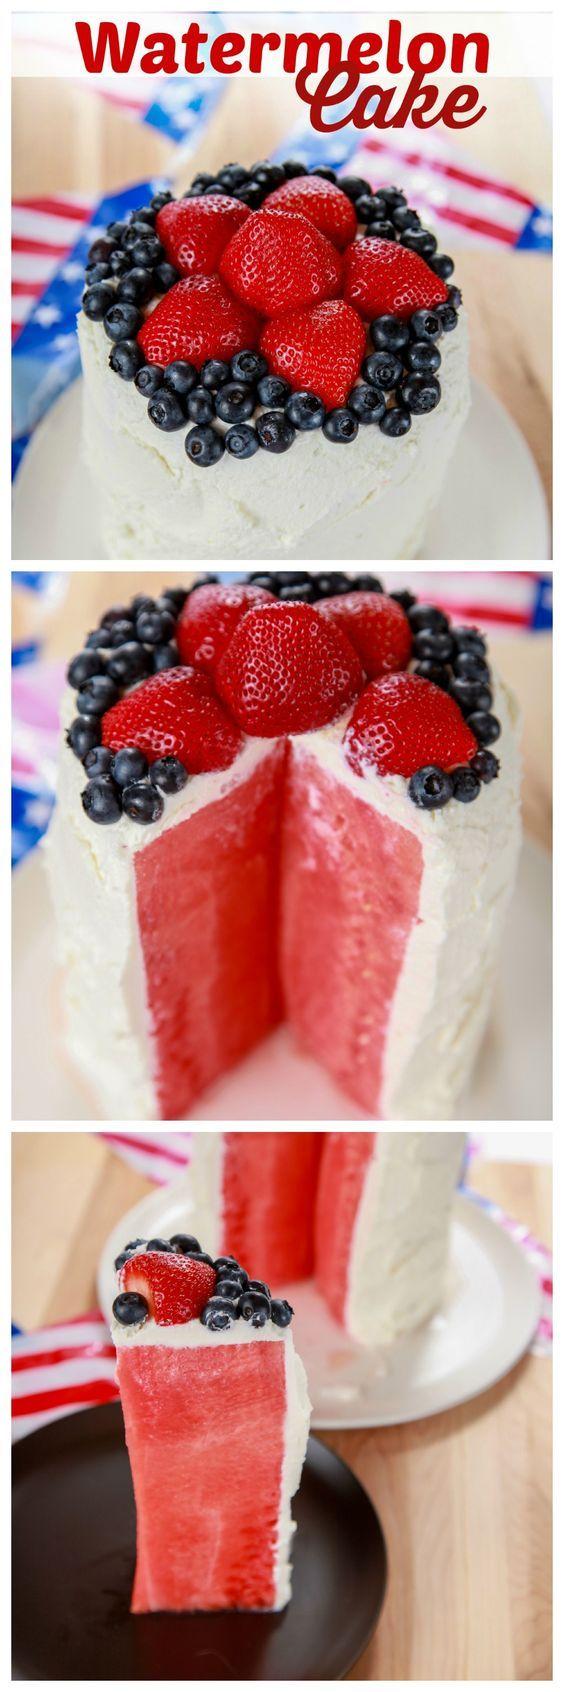 Watermelon Cake Tutorial + Recipe  #watermelon_cake #watermelon #cake #recipe  via bakingbeauty.net